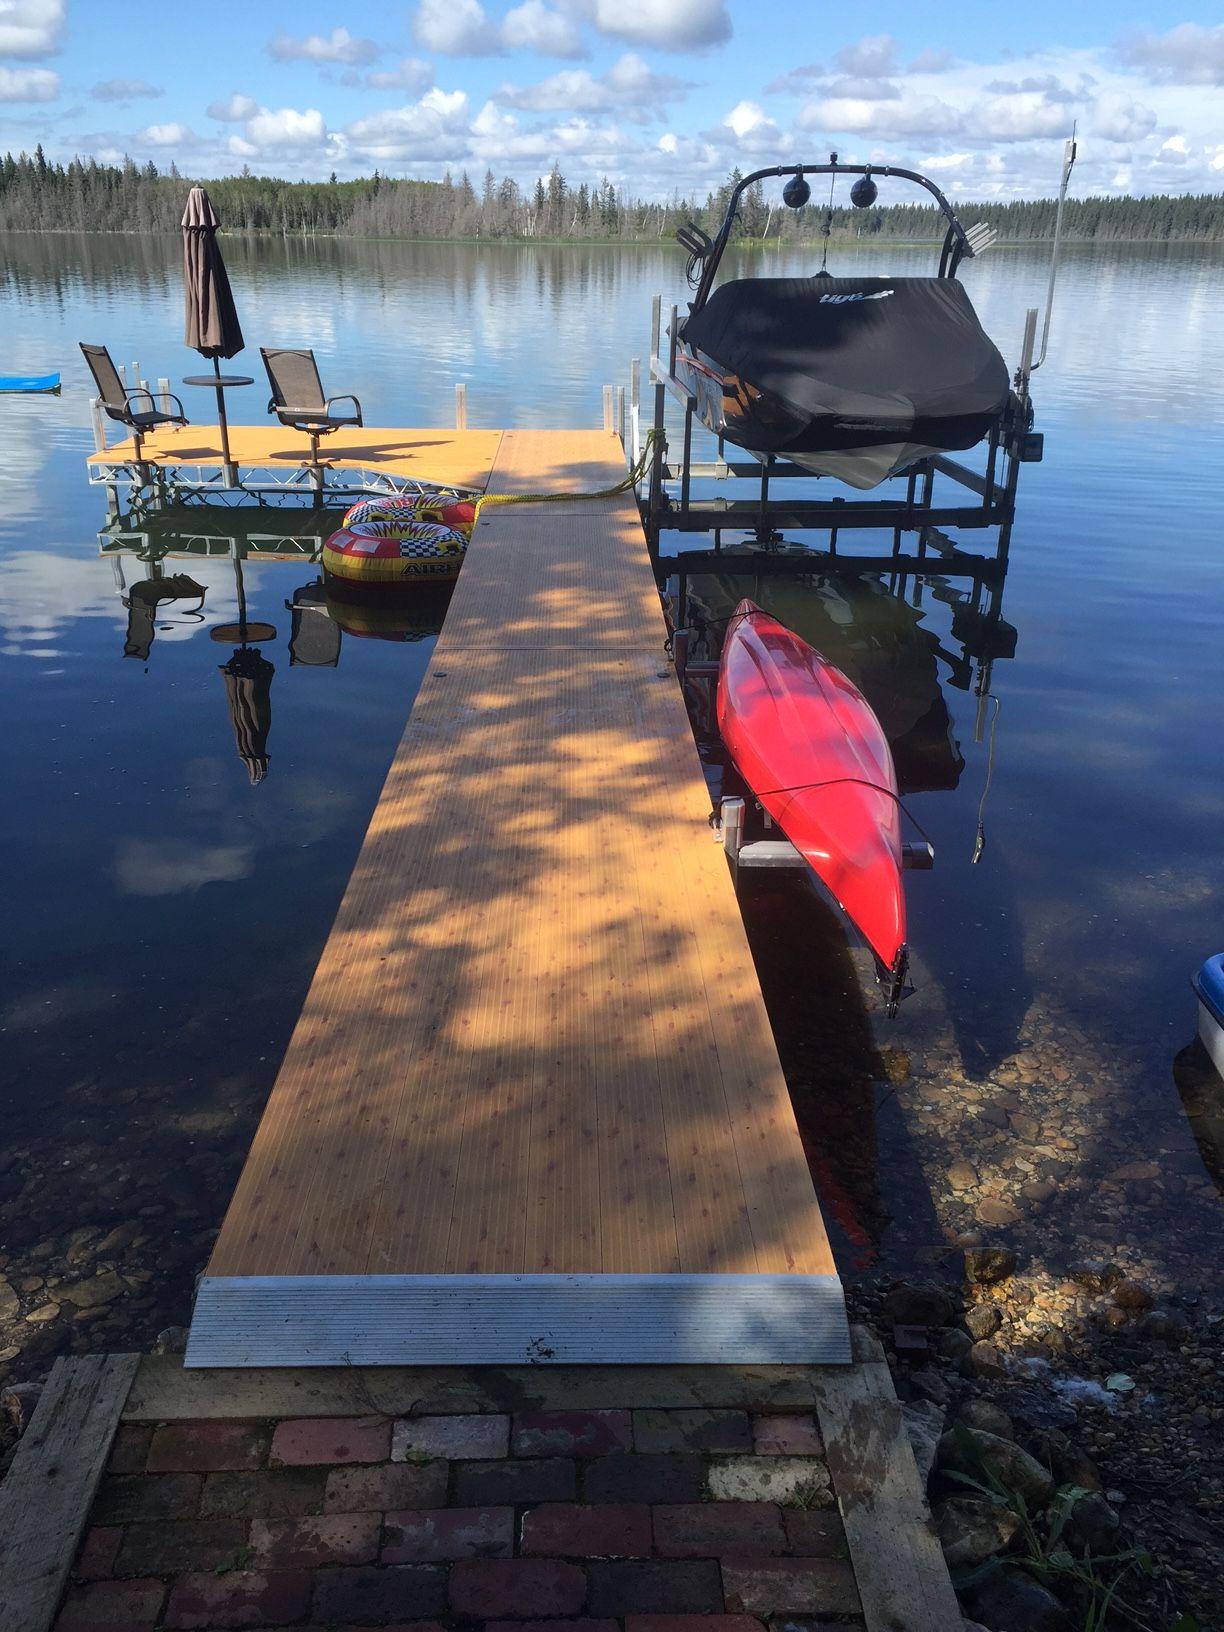 FLOE Dock, Lift, Chairs, Table And Umbrella And Kayak Rack